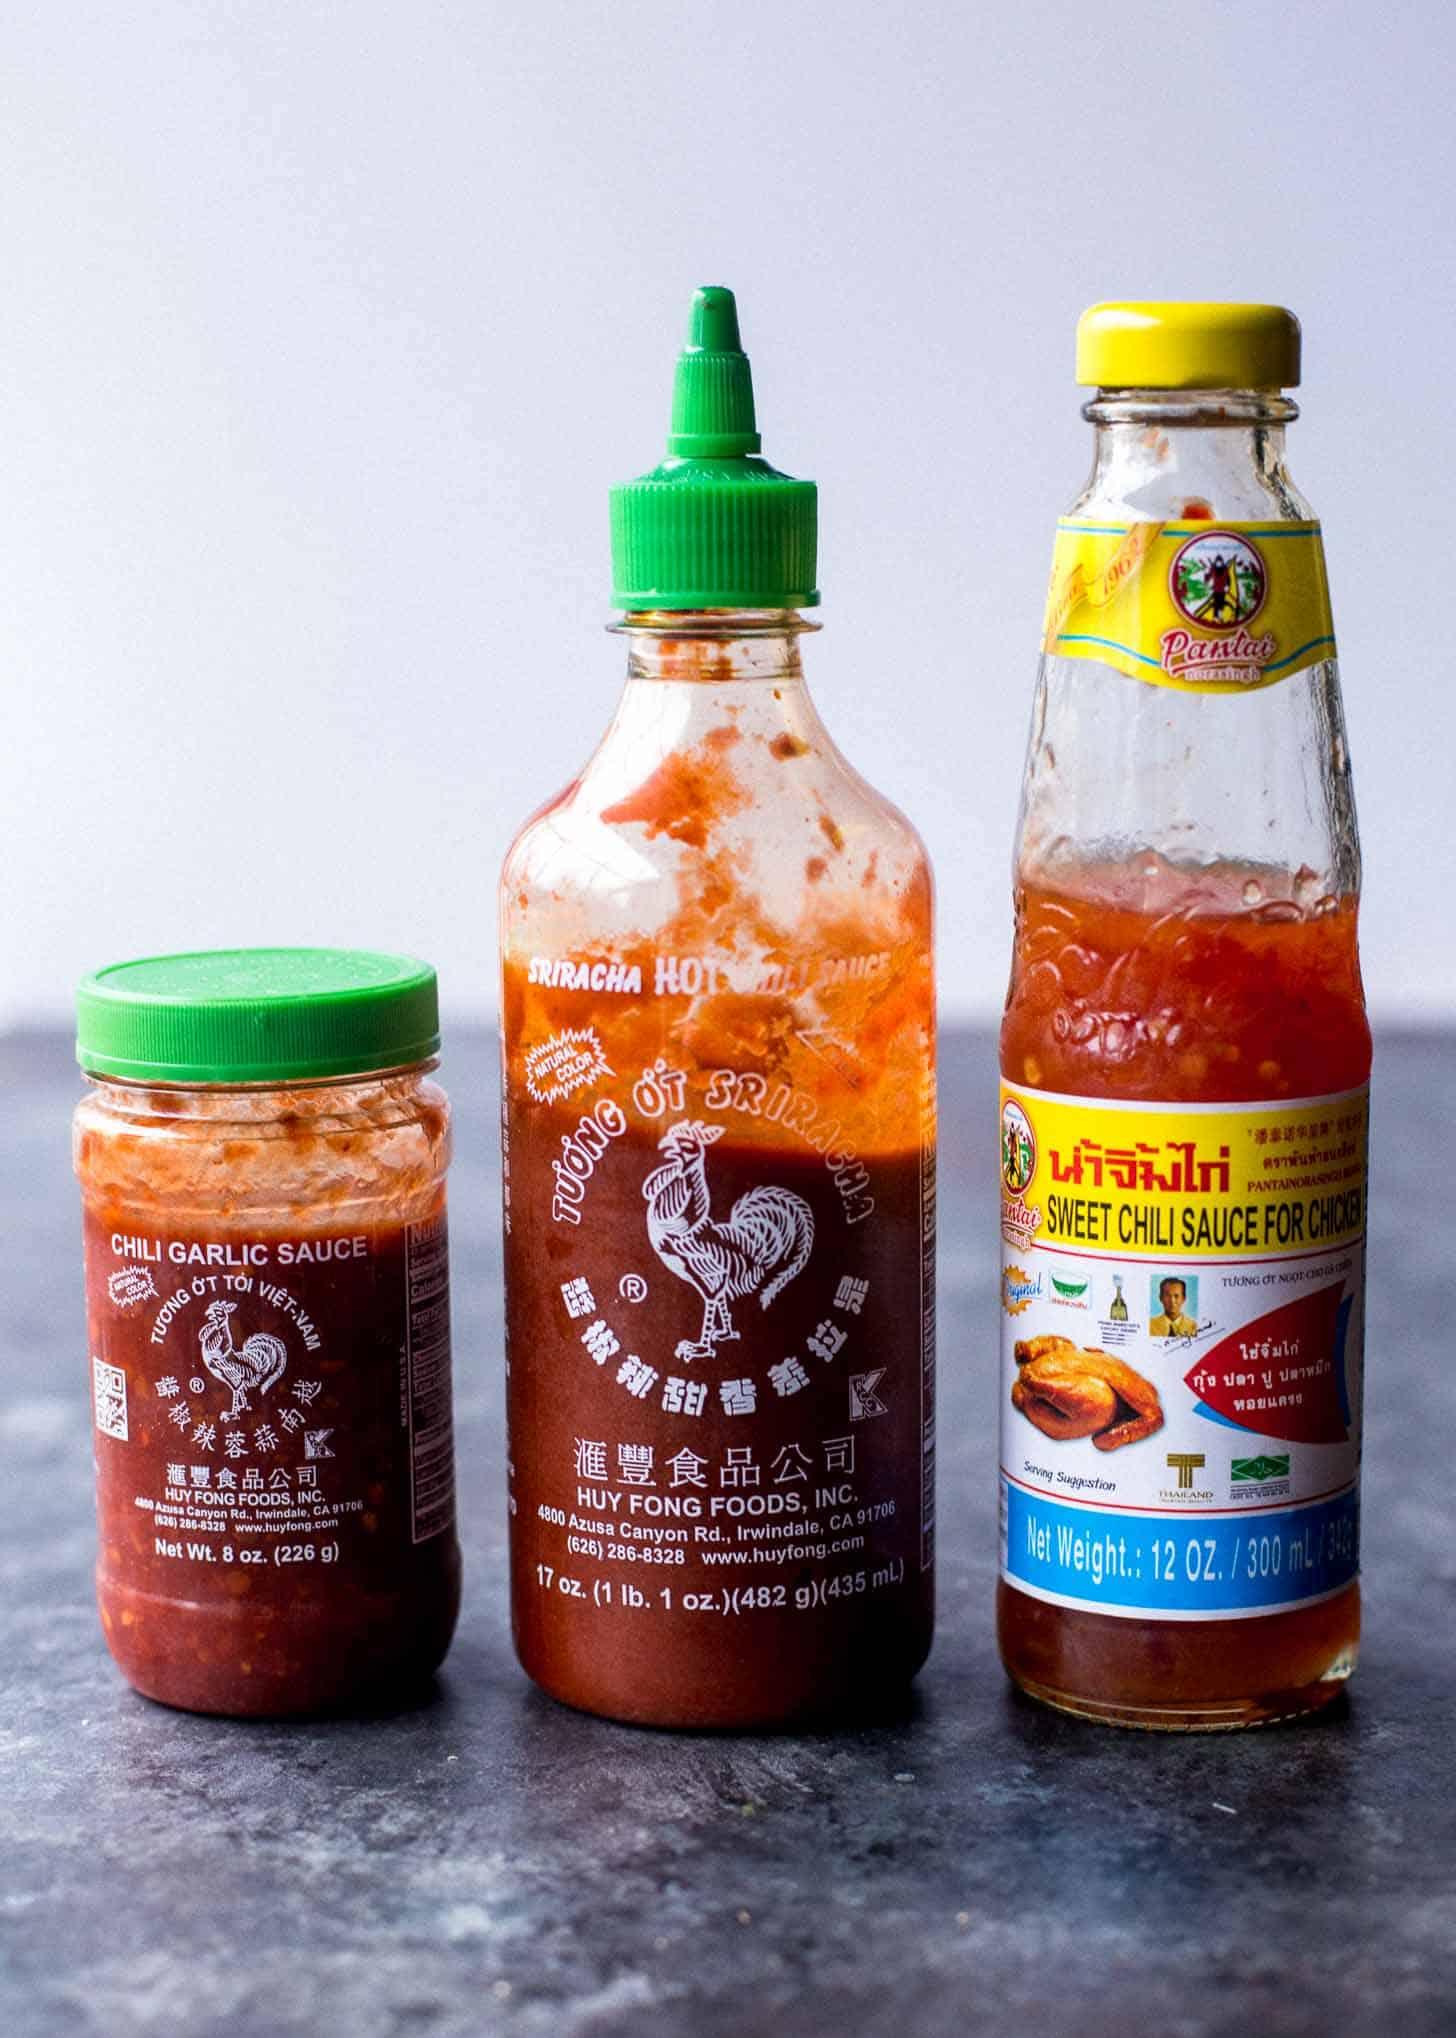 Bottles of Thai hot sauce on a grey countertop